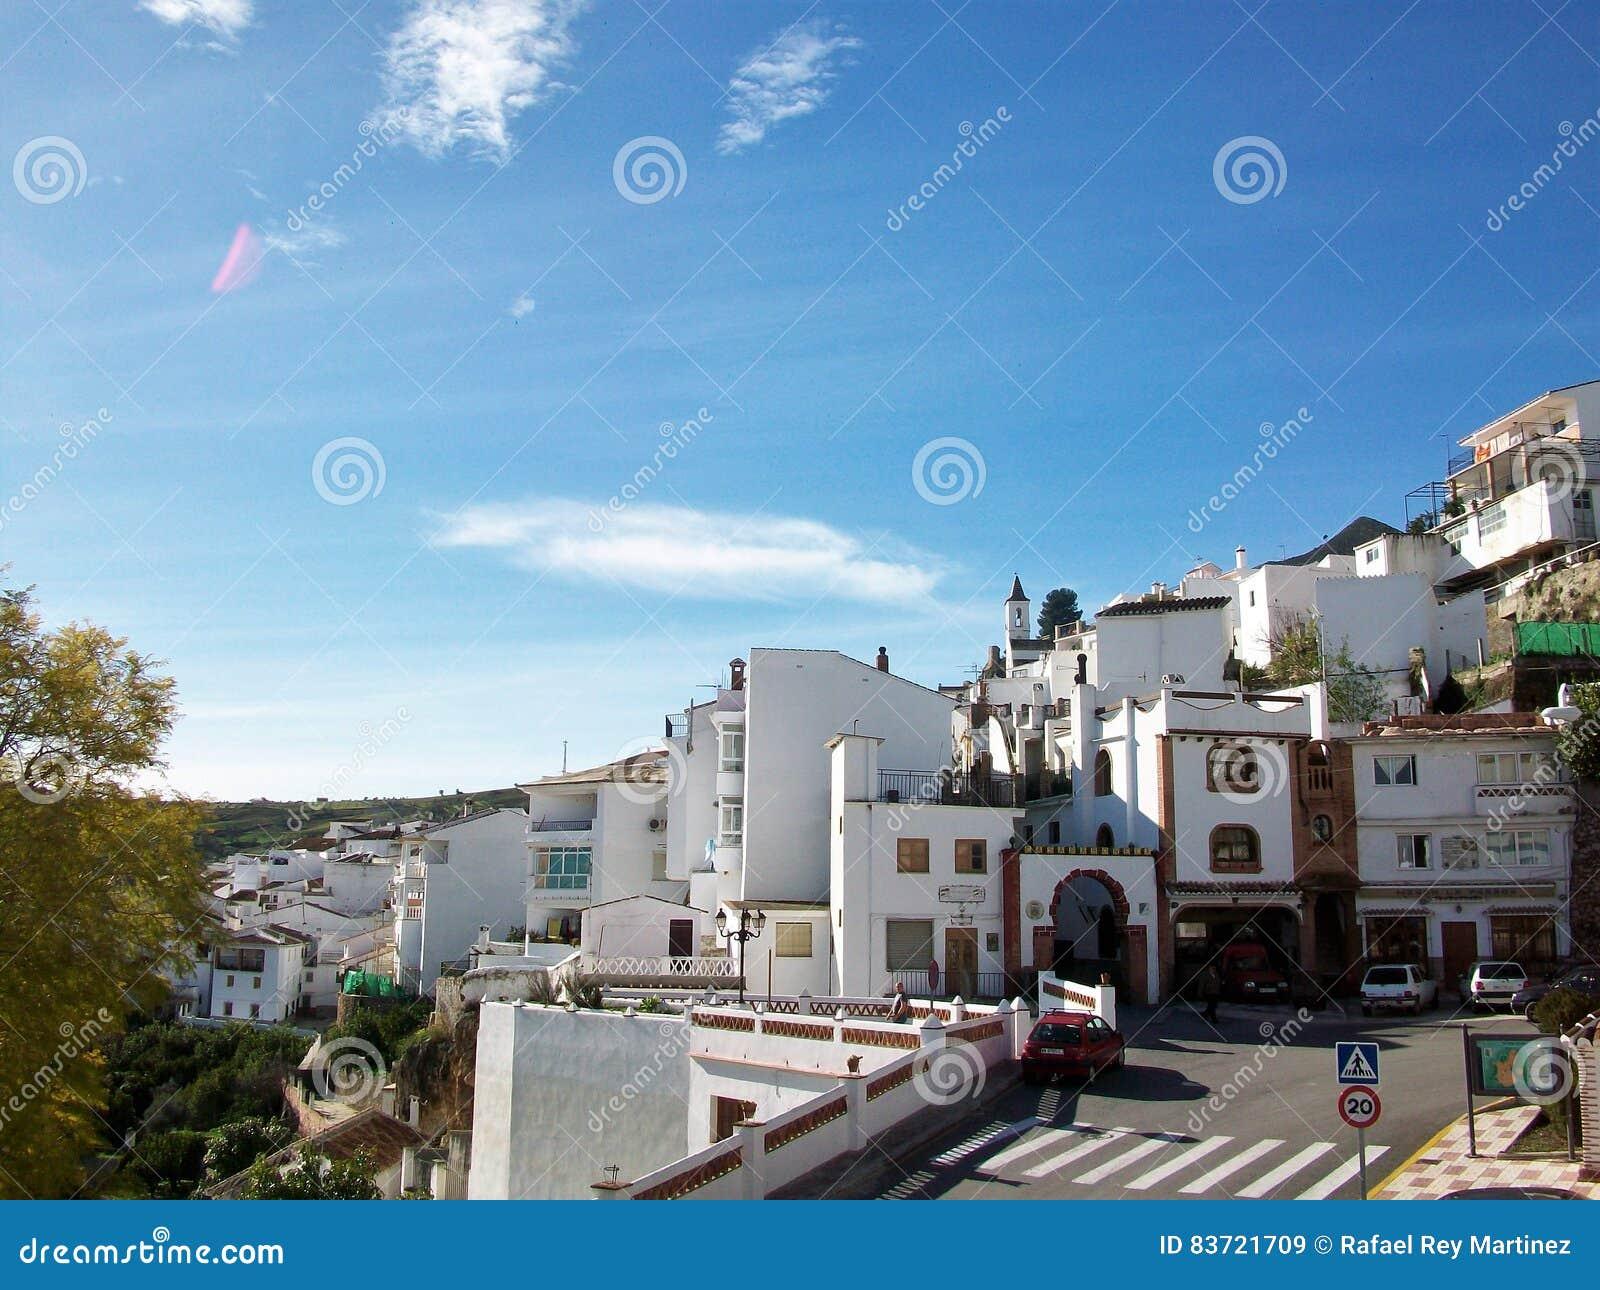 Village Of Casarabonela-Andalusia-Spain-Europe Editorial Stock Image